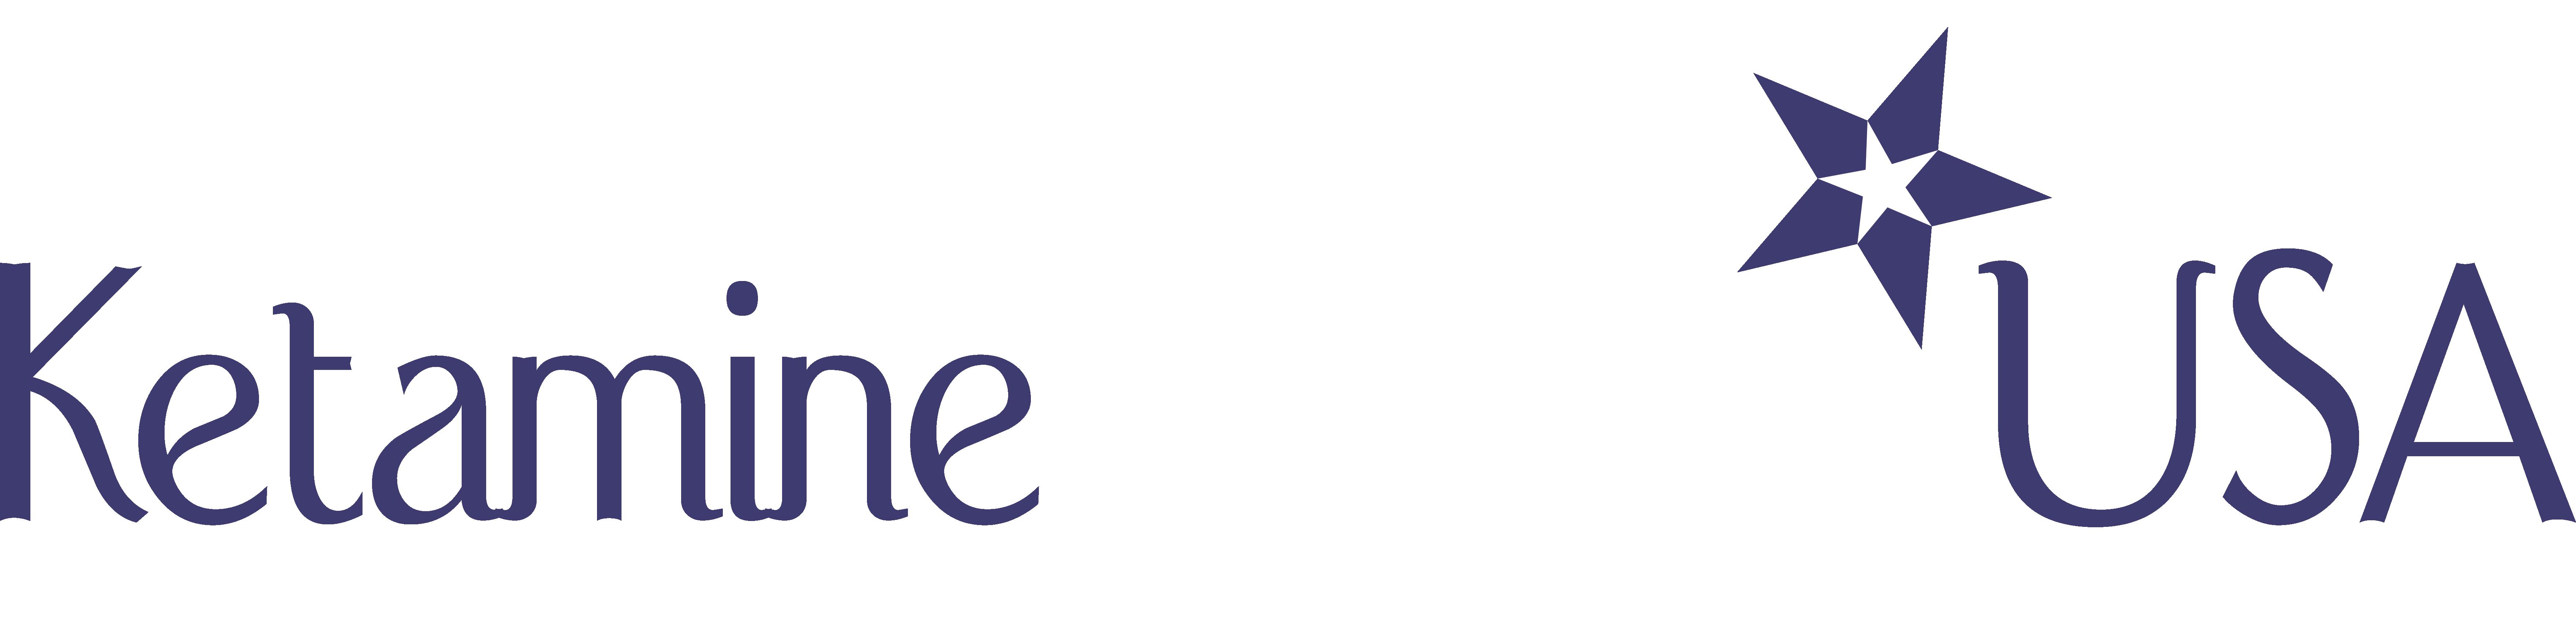 Ketamine Therapy USA | List of Ketamine Providers Nationwide